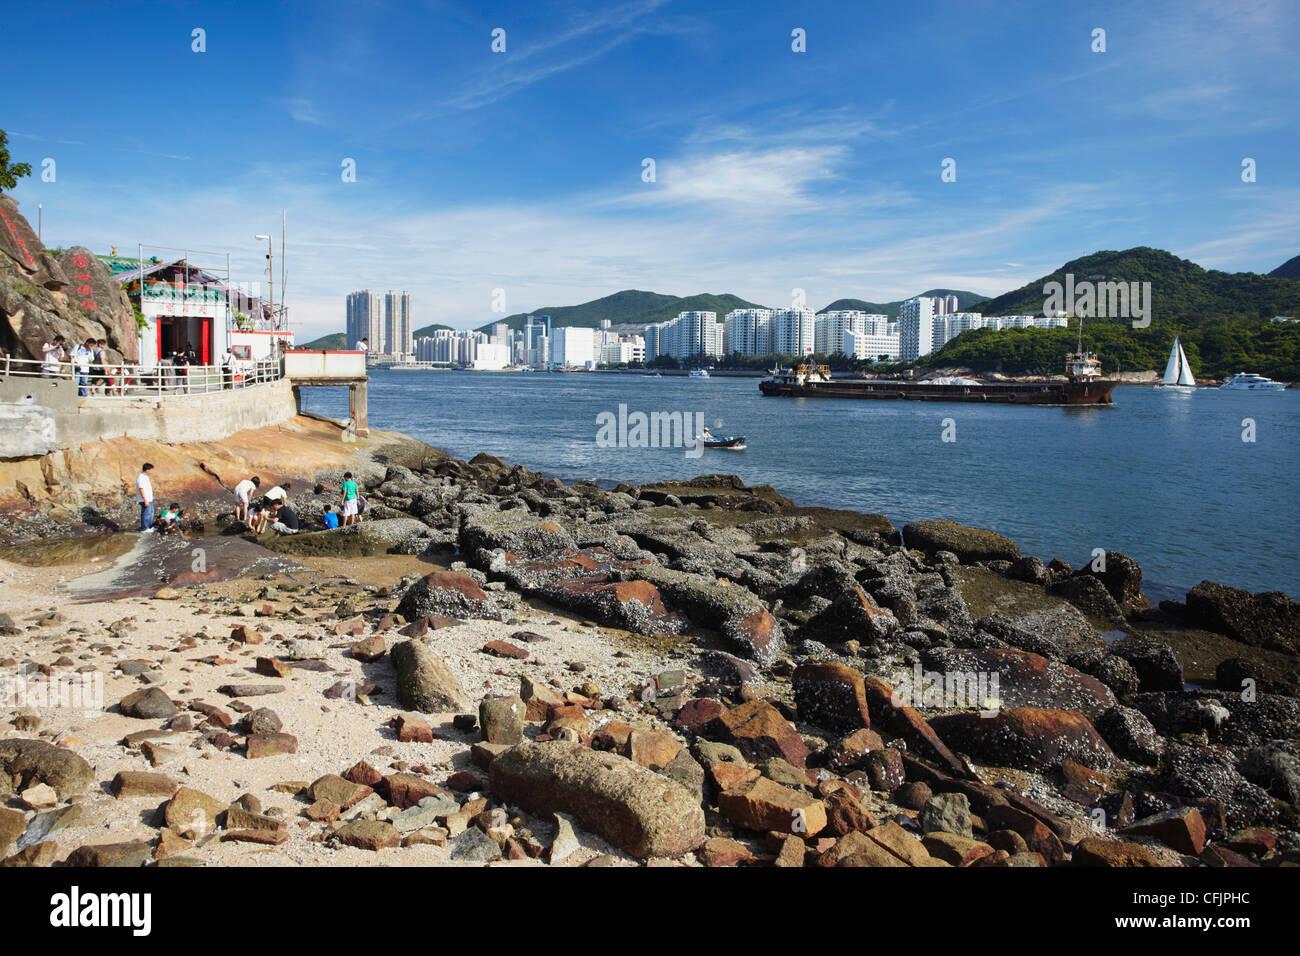 The last remaining natural coastline in Kowloon, Lei Yue Mun, Kowloon, Hong Kong, China, Asia - Stock Image